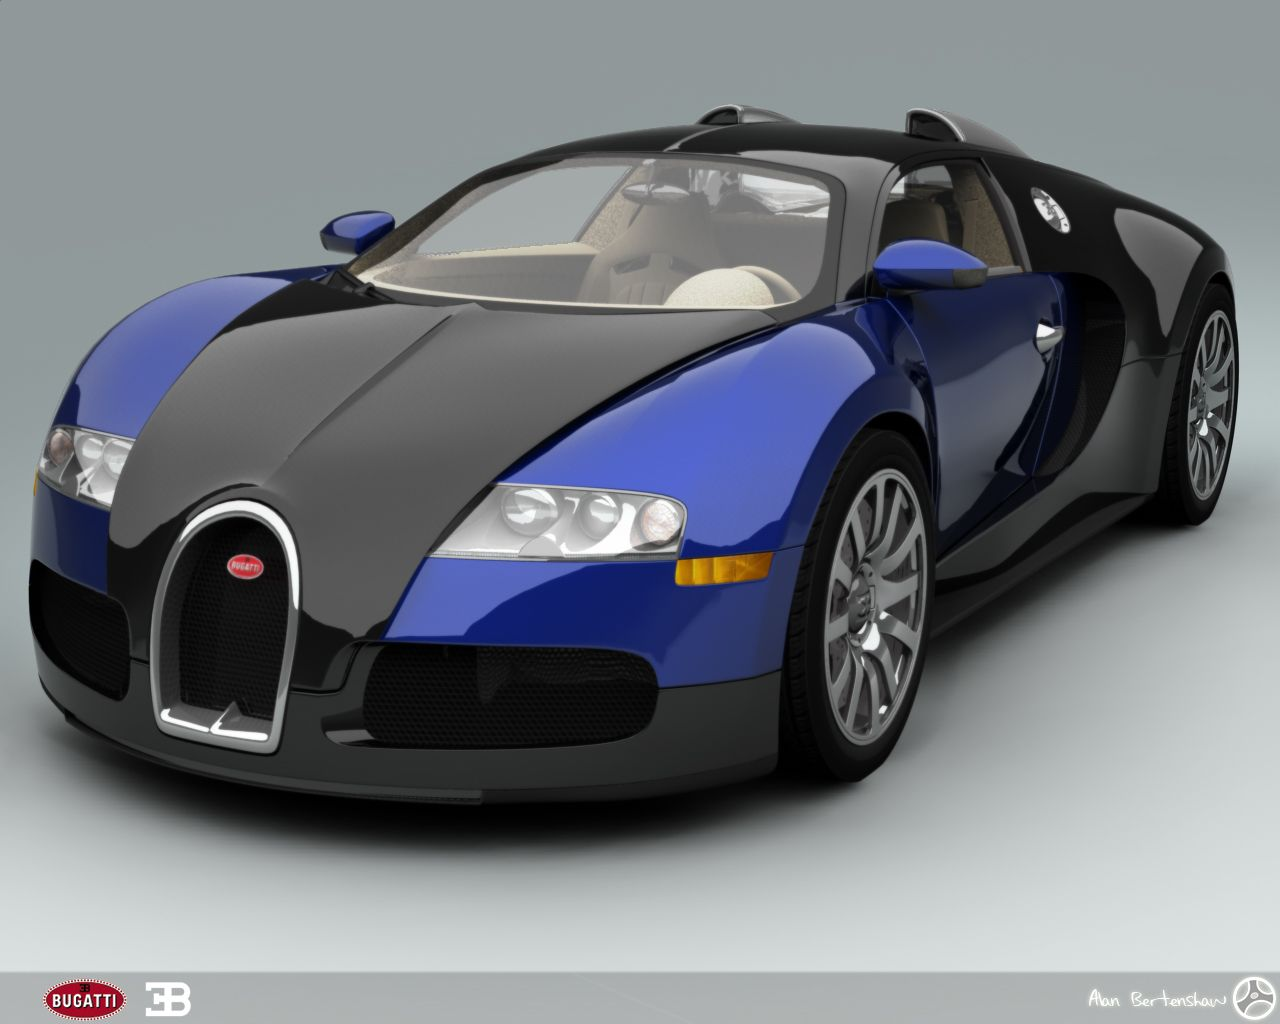 Bugari Car 2010 Bugatti Veyron Super Sport Overview